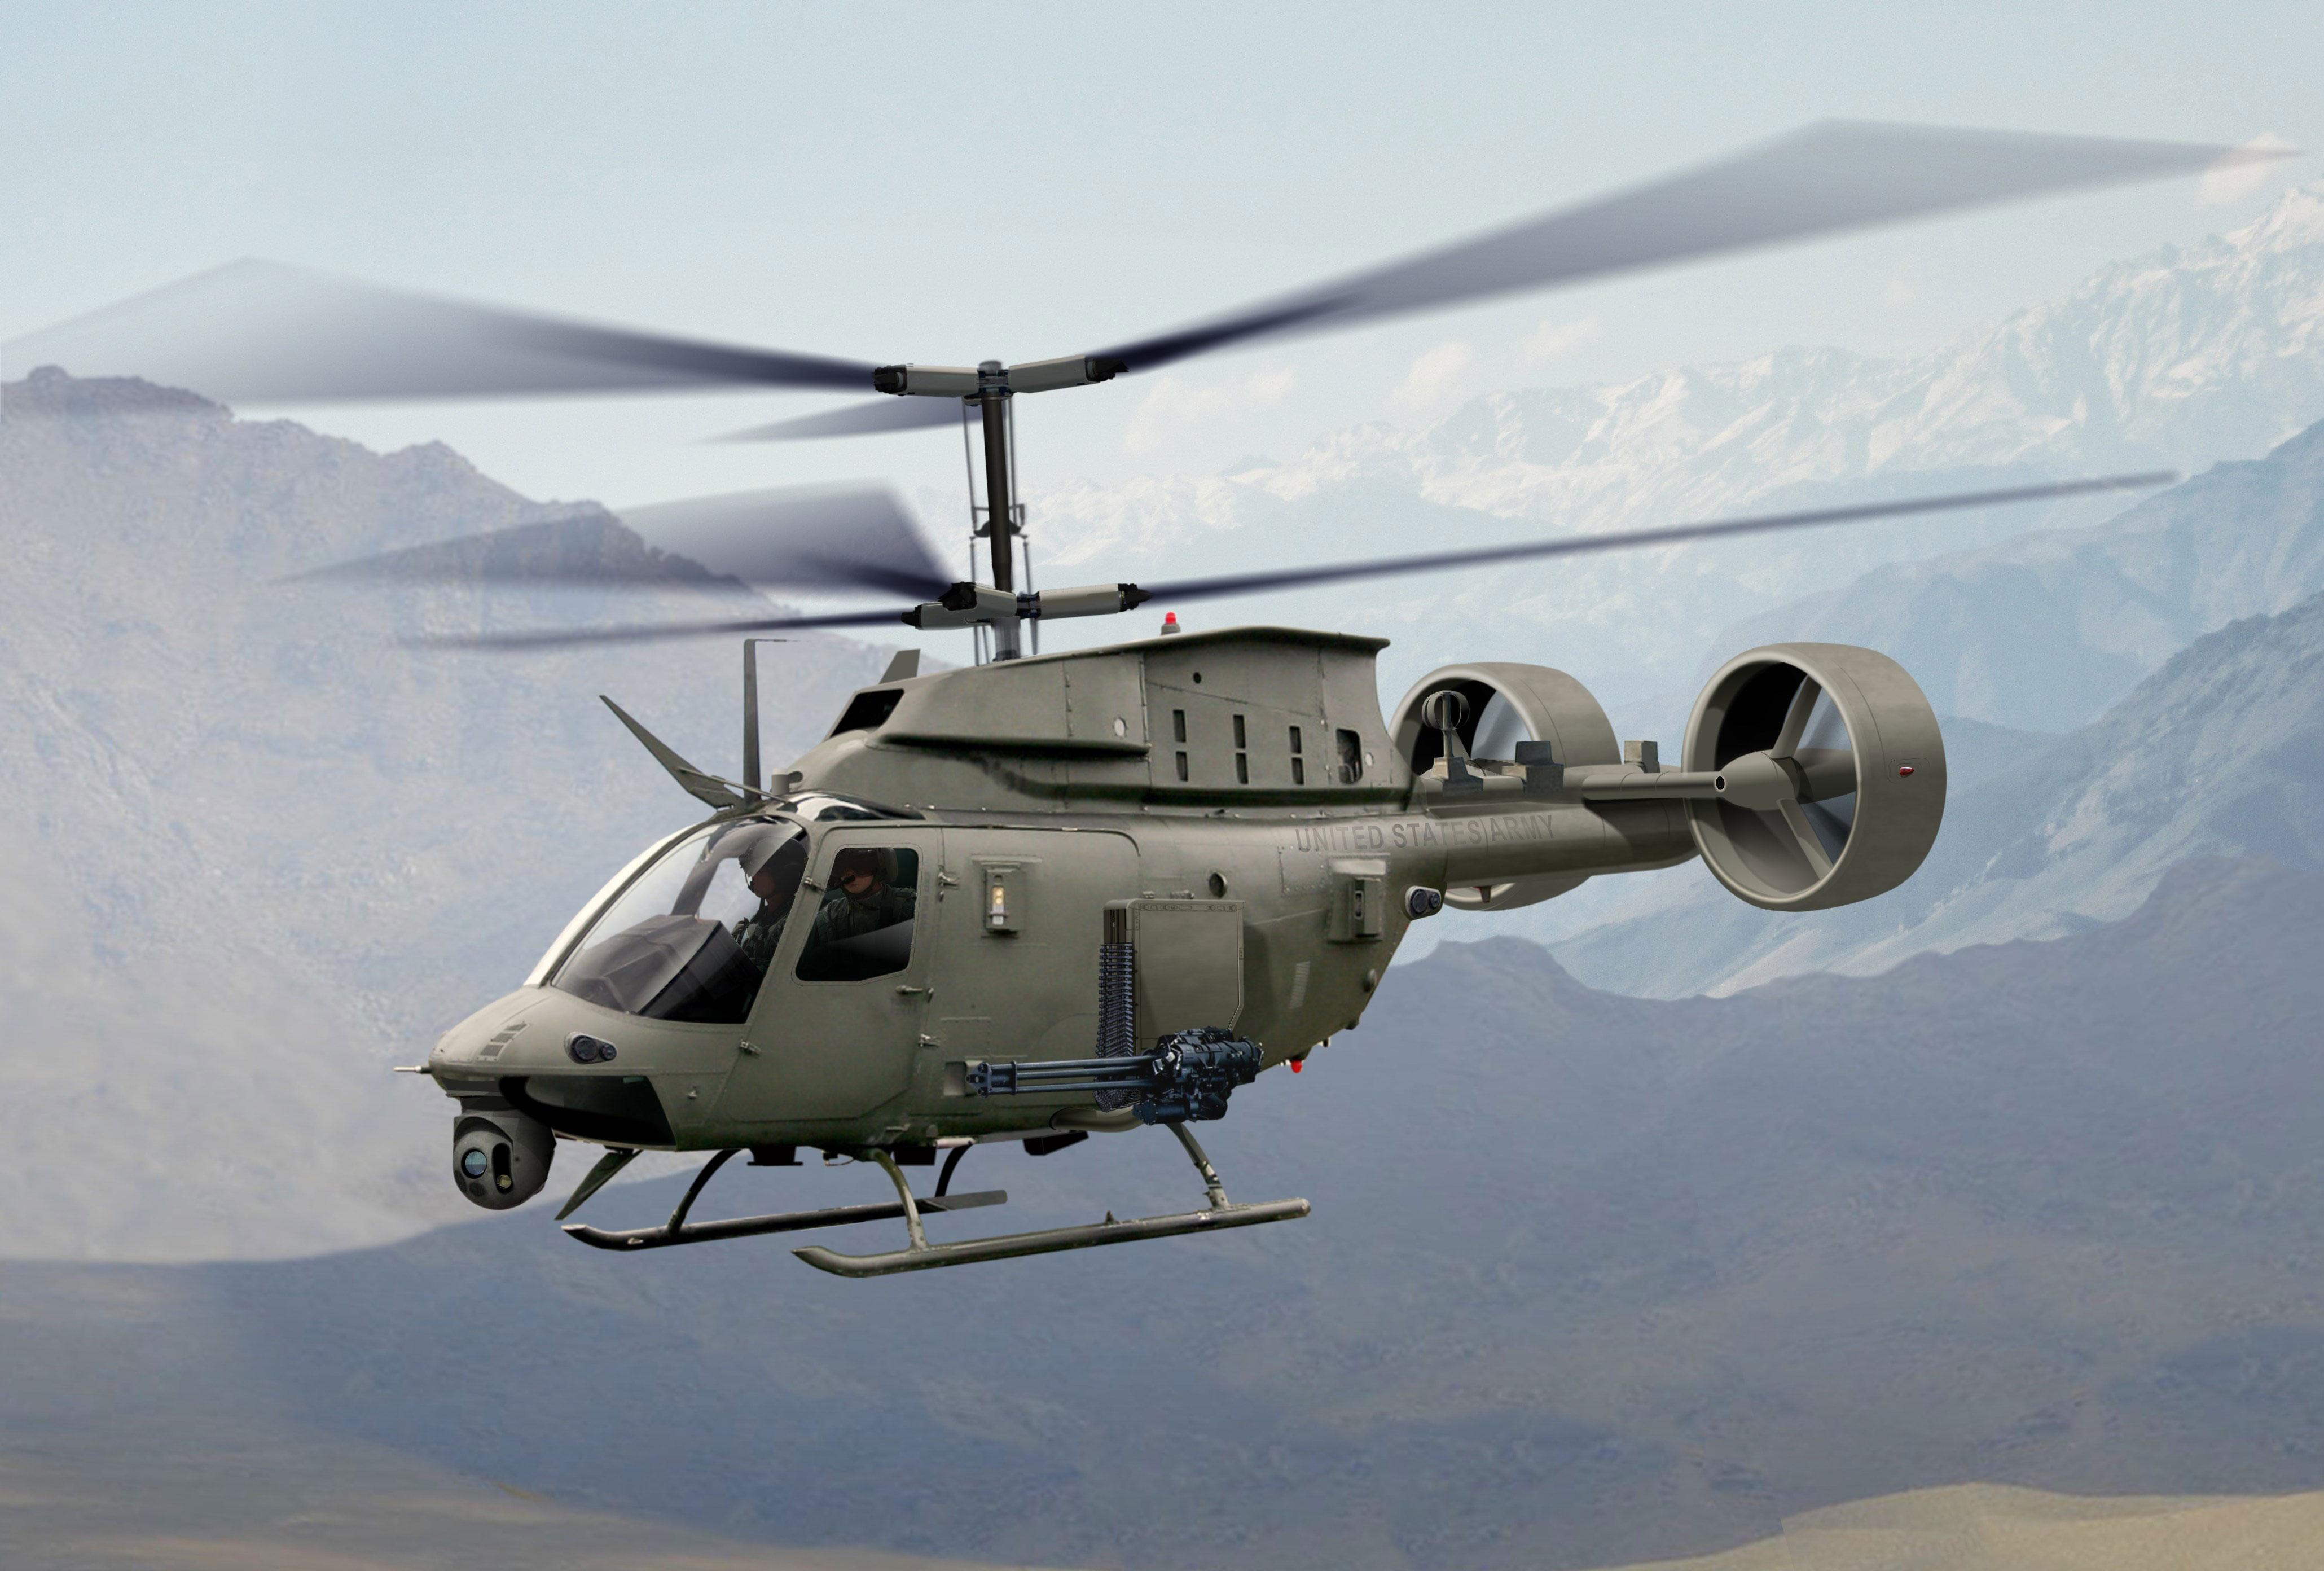 Military Helicopter 4k Hd Desktop Wallpaper For 4k Ultra: Helicopter 4k Ultra HD Wallpaper And Background Image